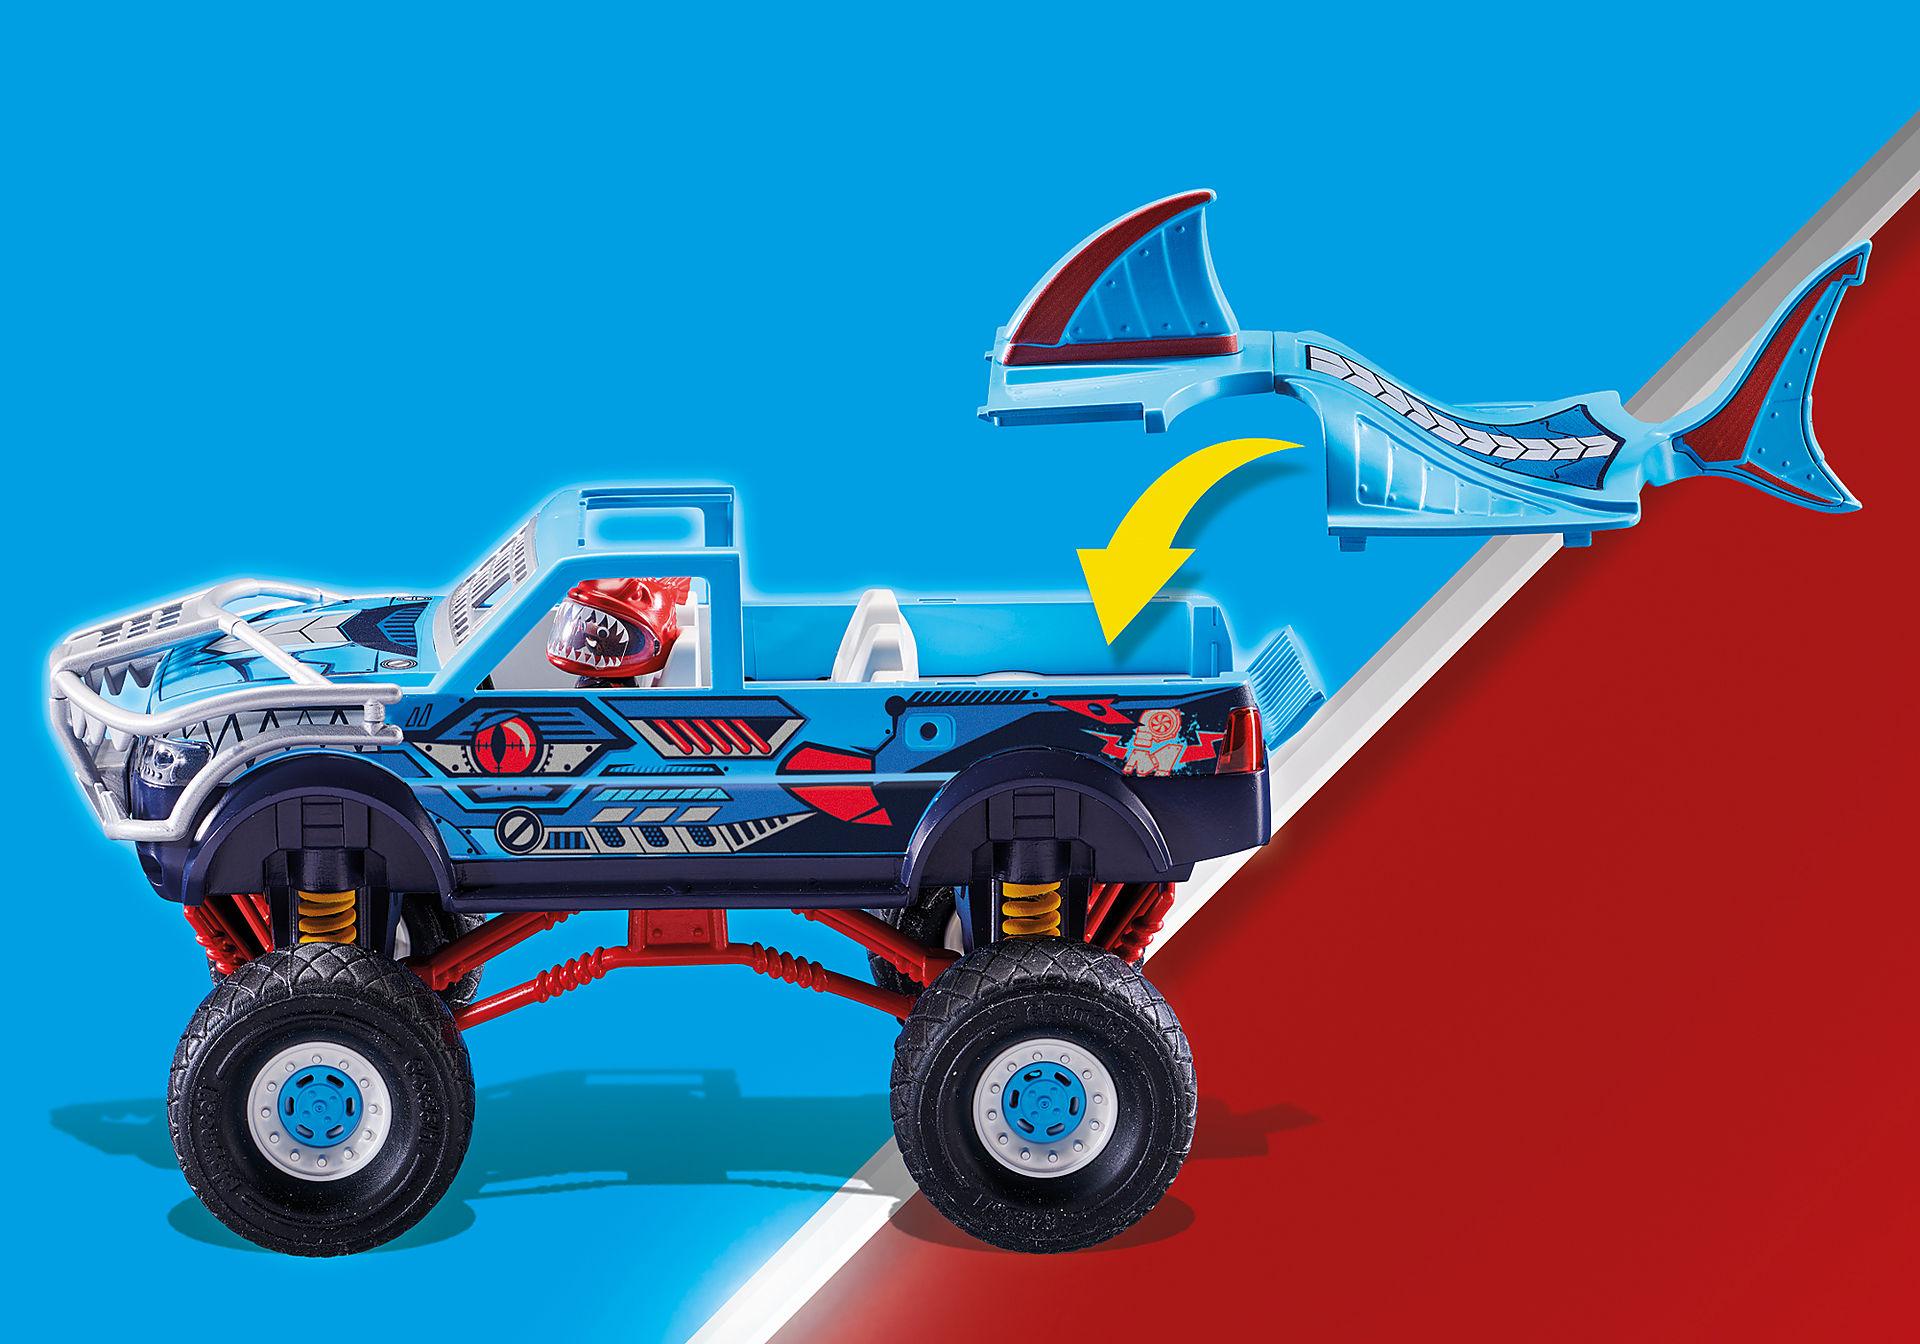 70550 Pokaz kaskaderski: Monster Truck Rekin zoom image6